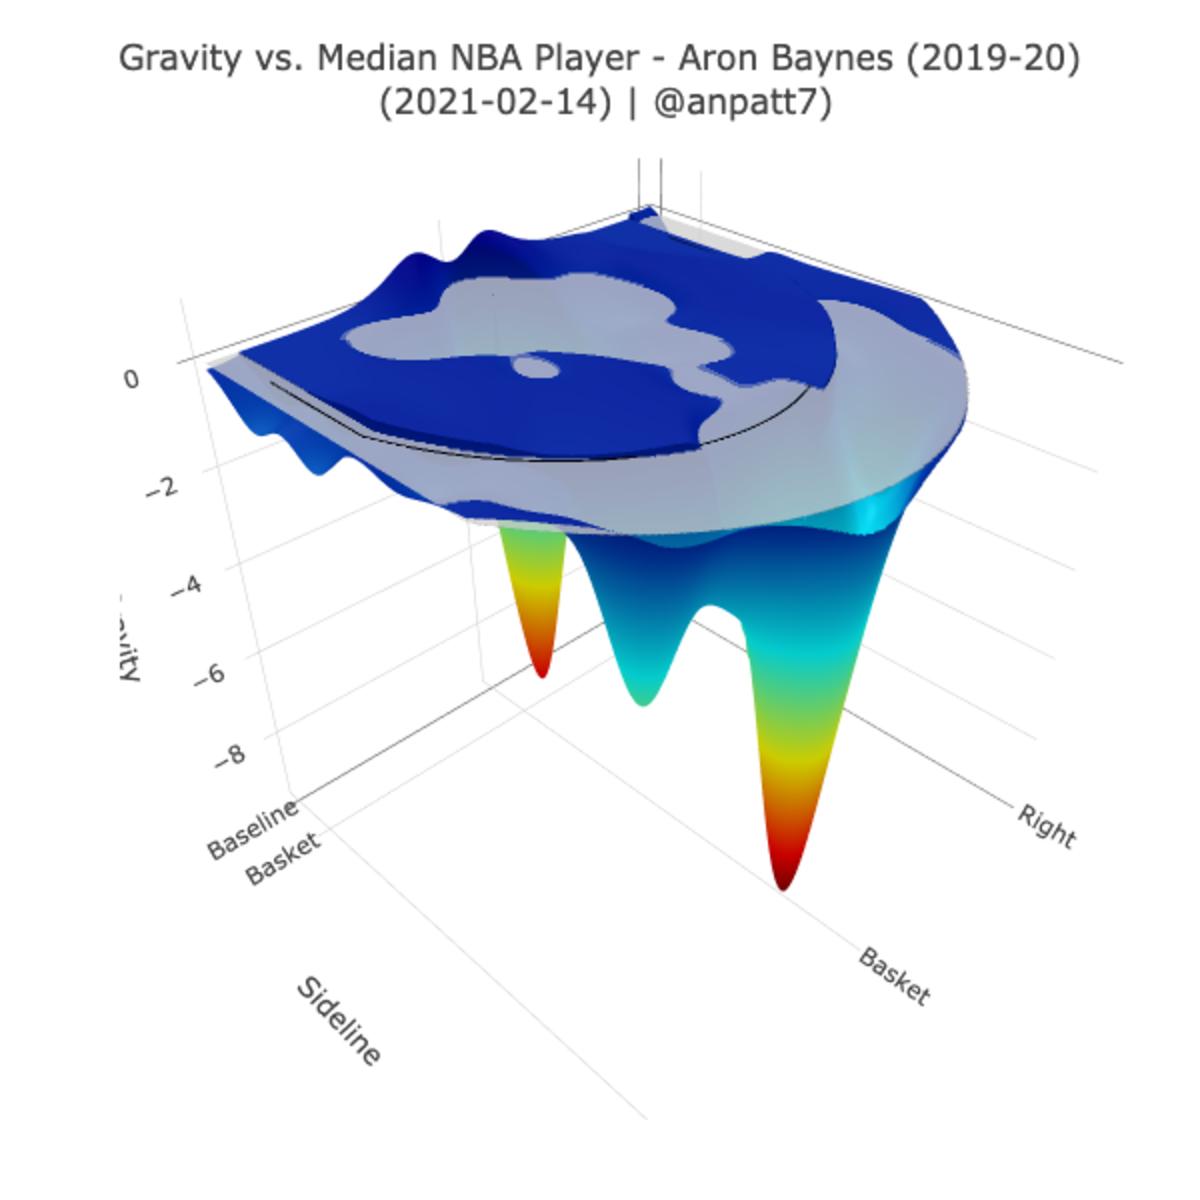 Aron Baynes' gravity chart for 2019-20